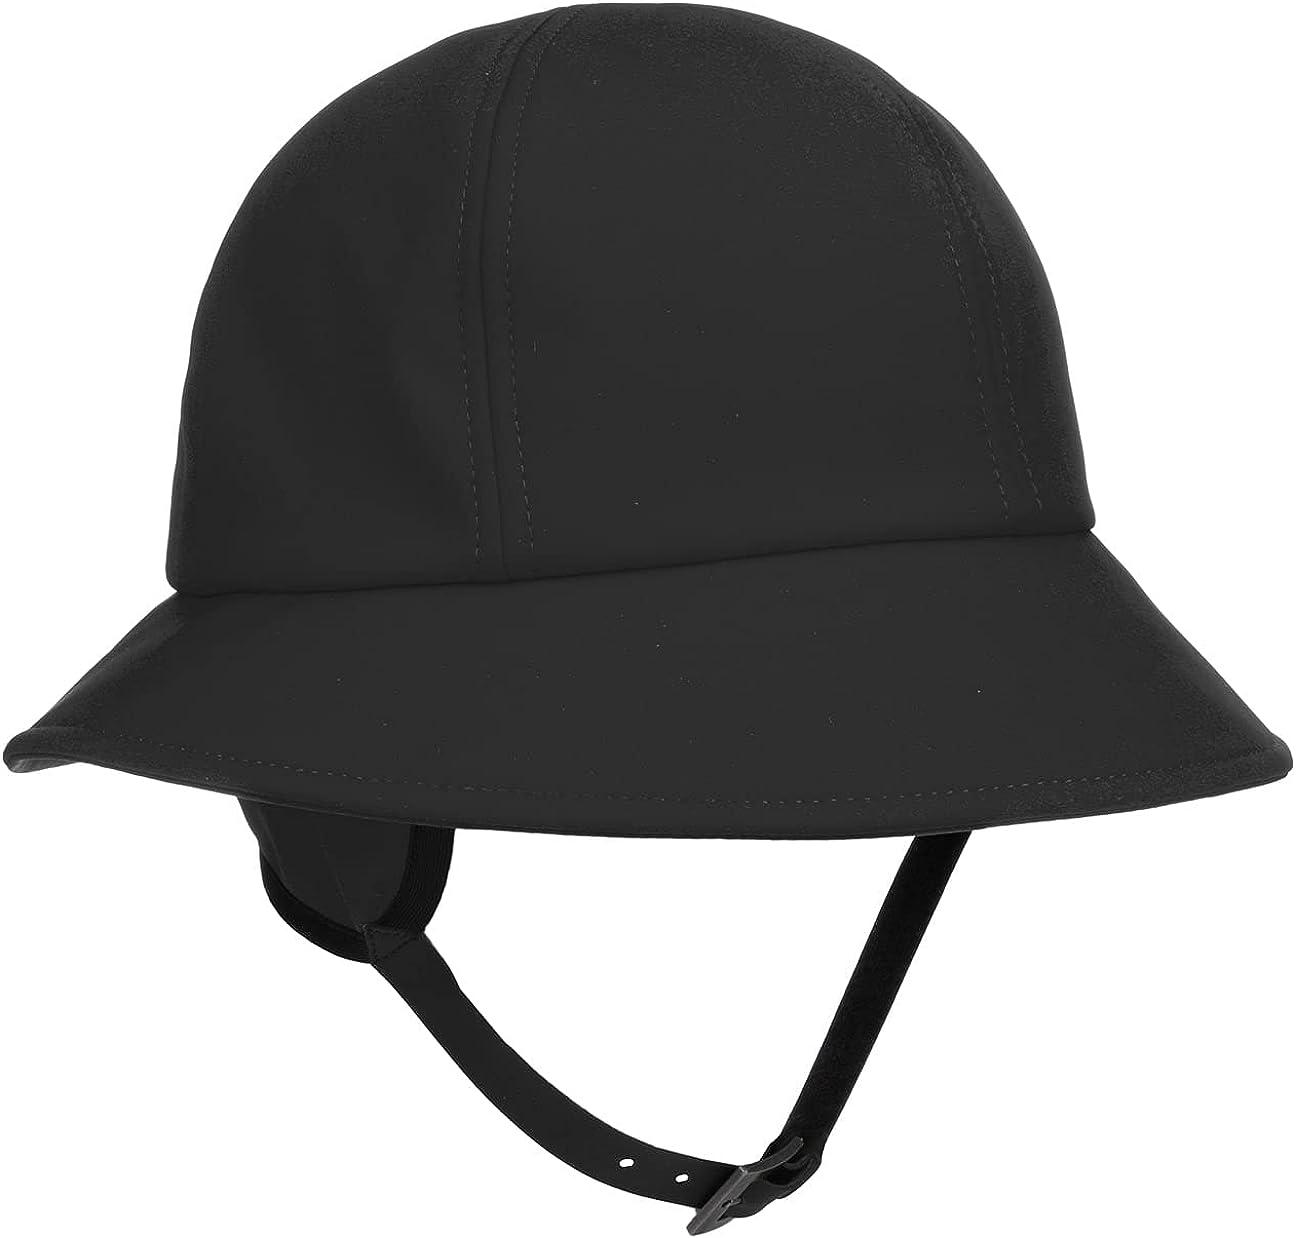 Mayser Eila Soft Shell Rain Hat Women - Made in The EU